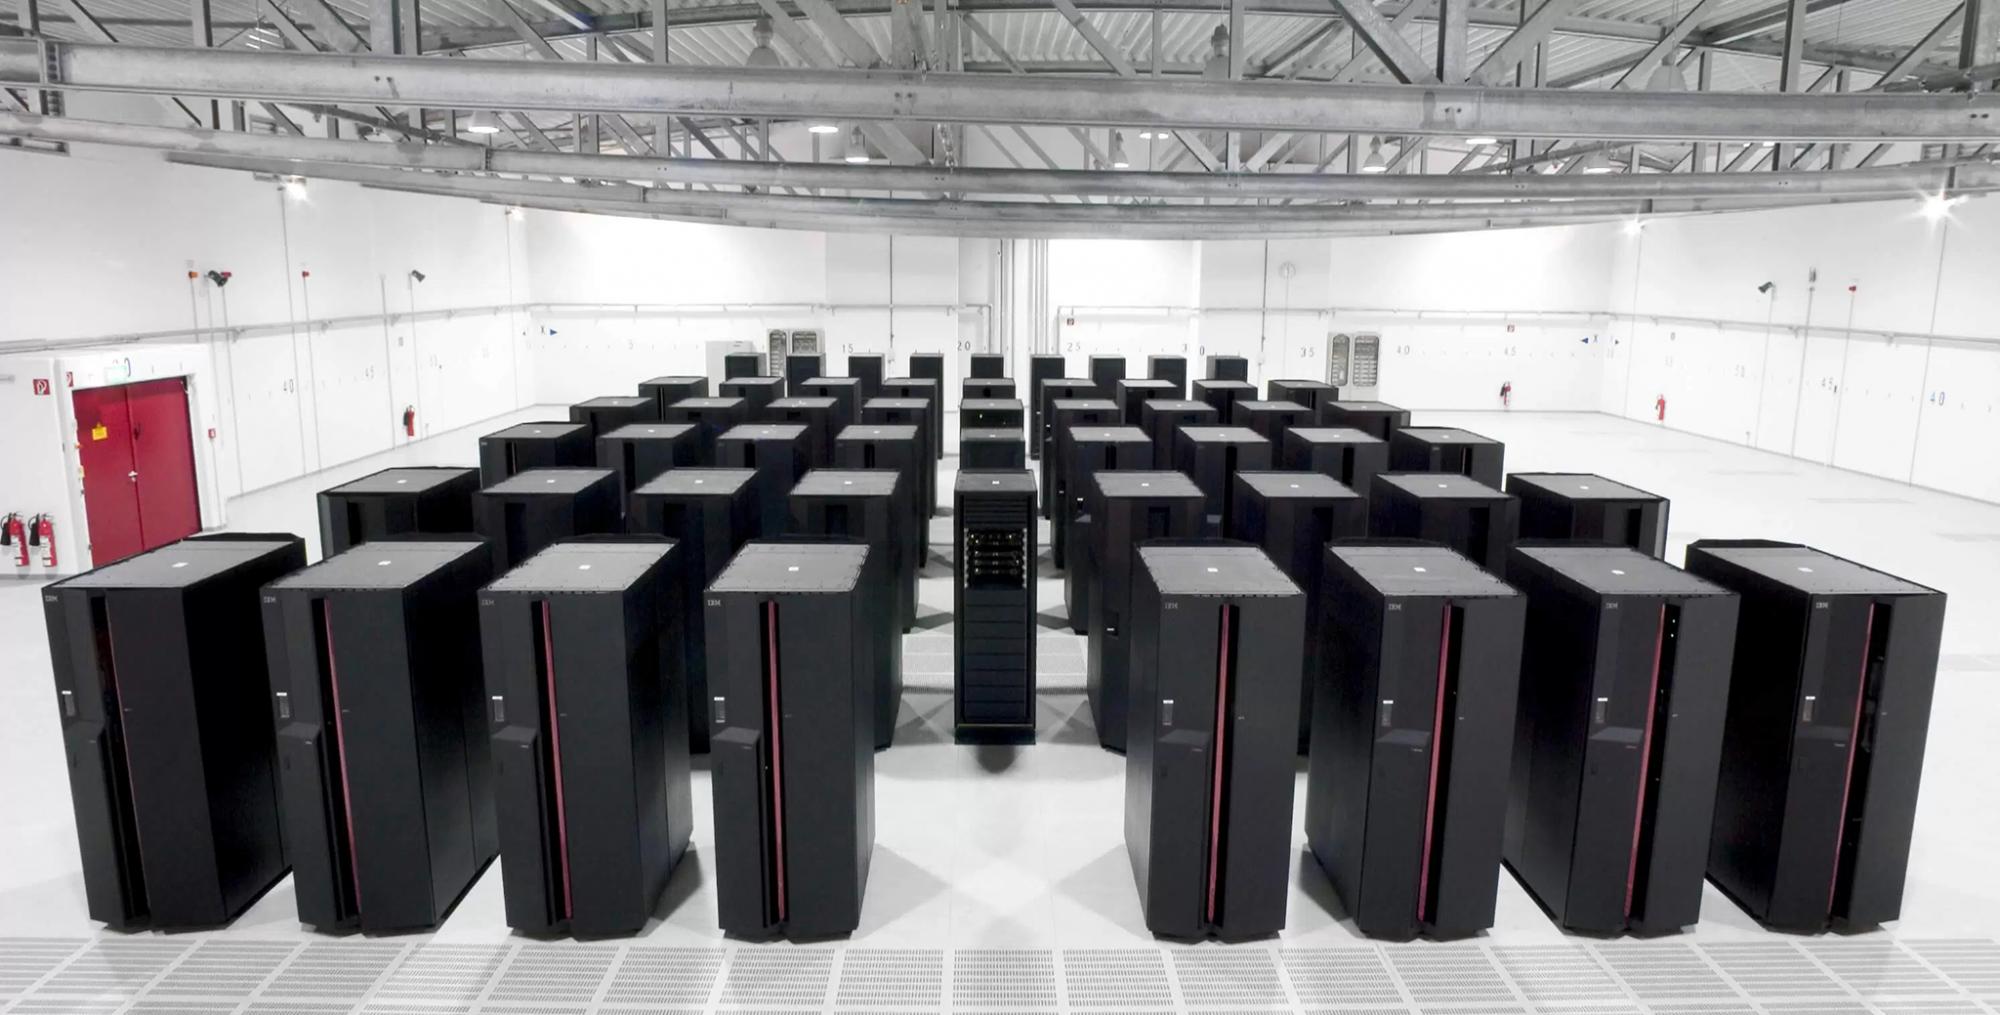 Demain, notre cancérologue sera un de ces superordinateurs